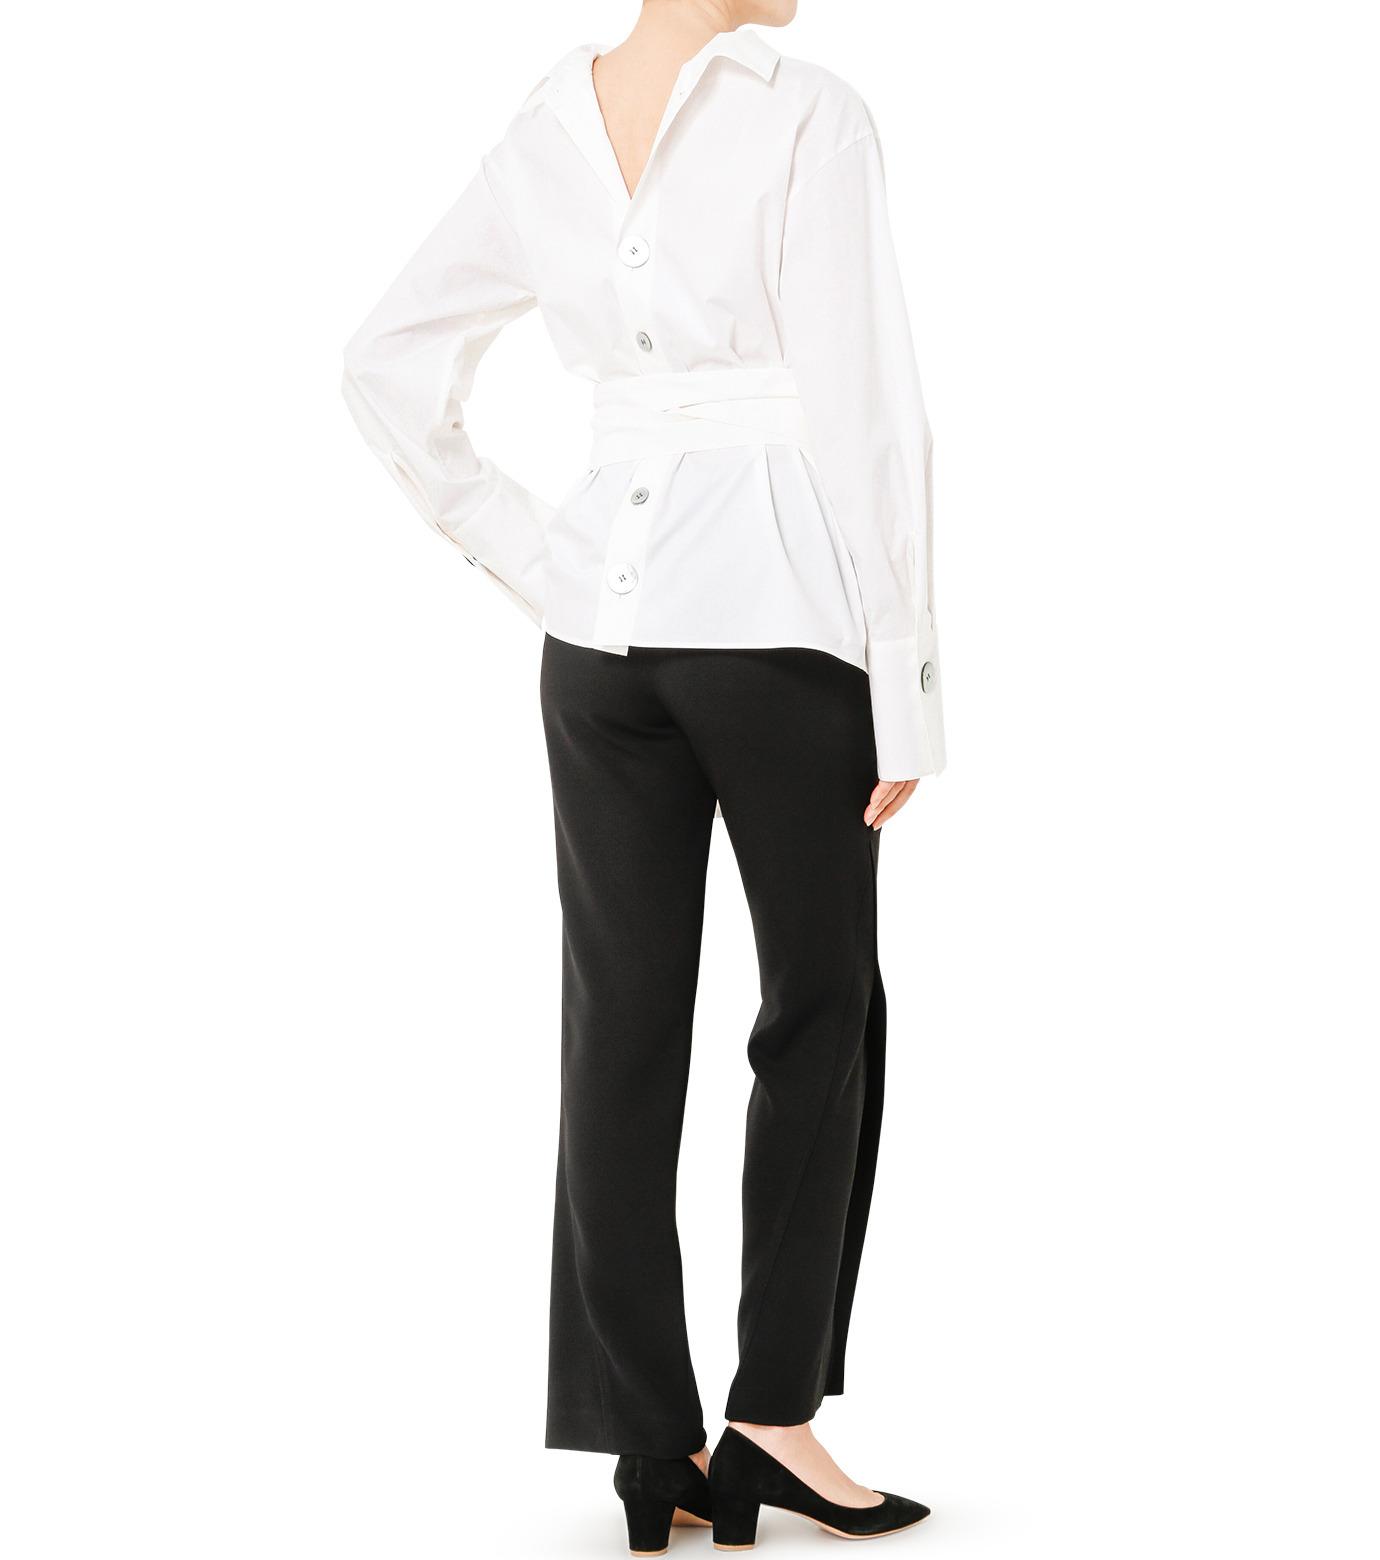 LE CIEL BLEU(ルシェルブルー)のバックオープンシャツ-WHITE(シャツ/shirt)-19S63103 拡大詳細画像3